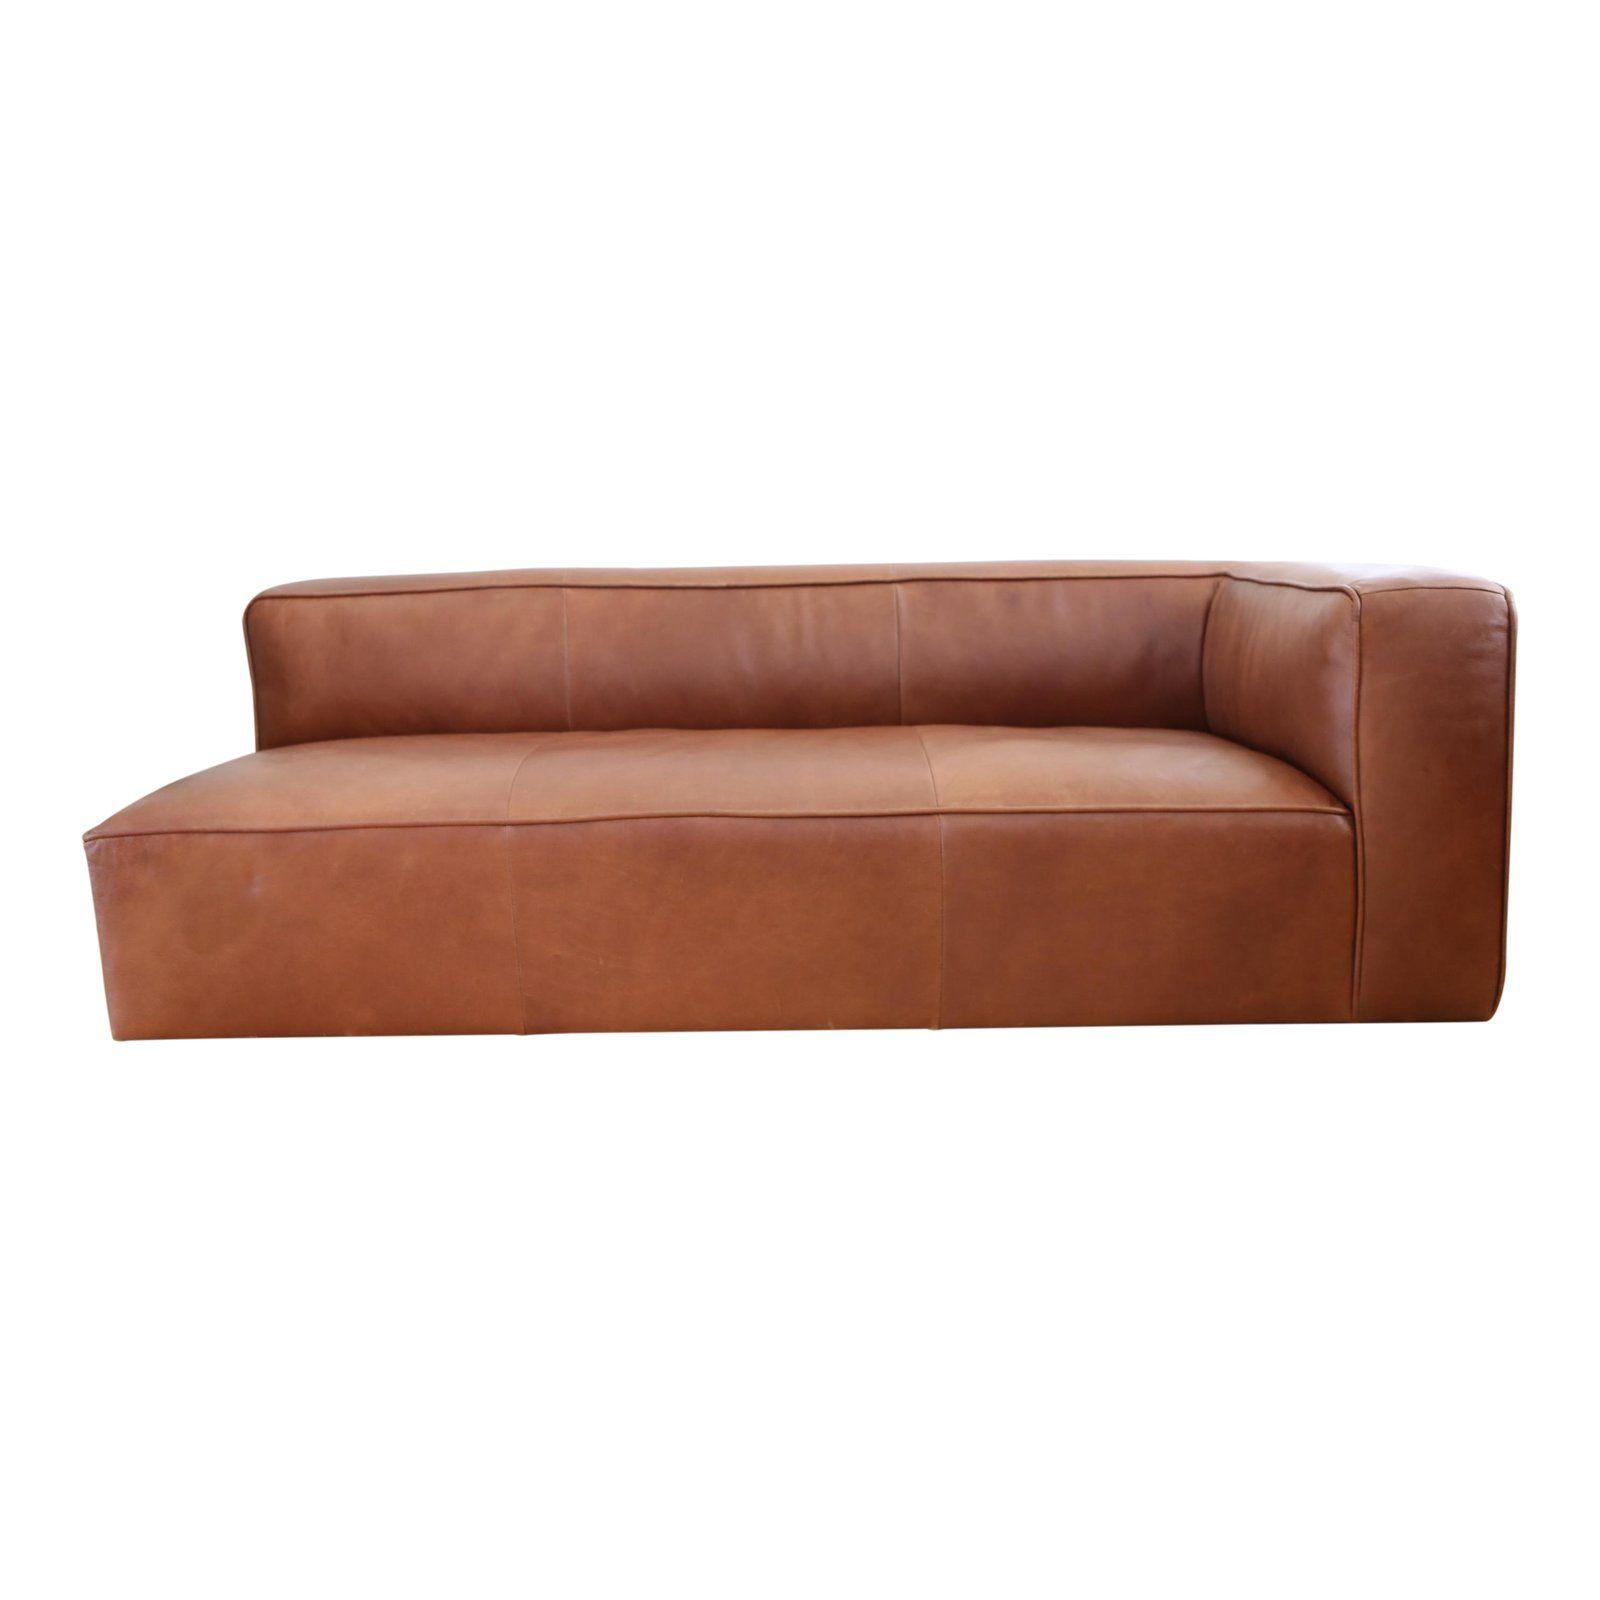 Mid Century Modern Leather Sofa For Sale Modern Leather Sofa